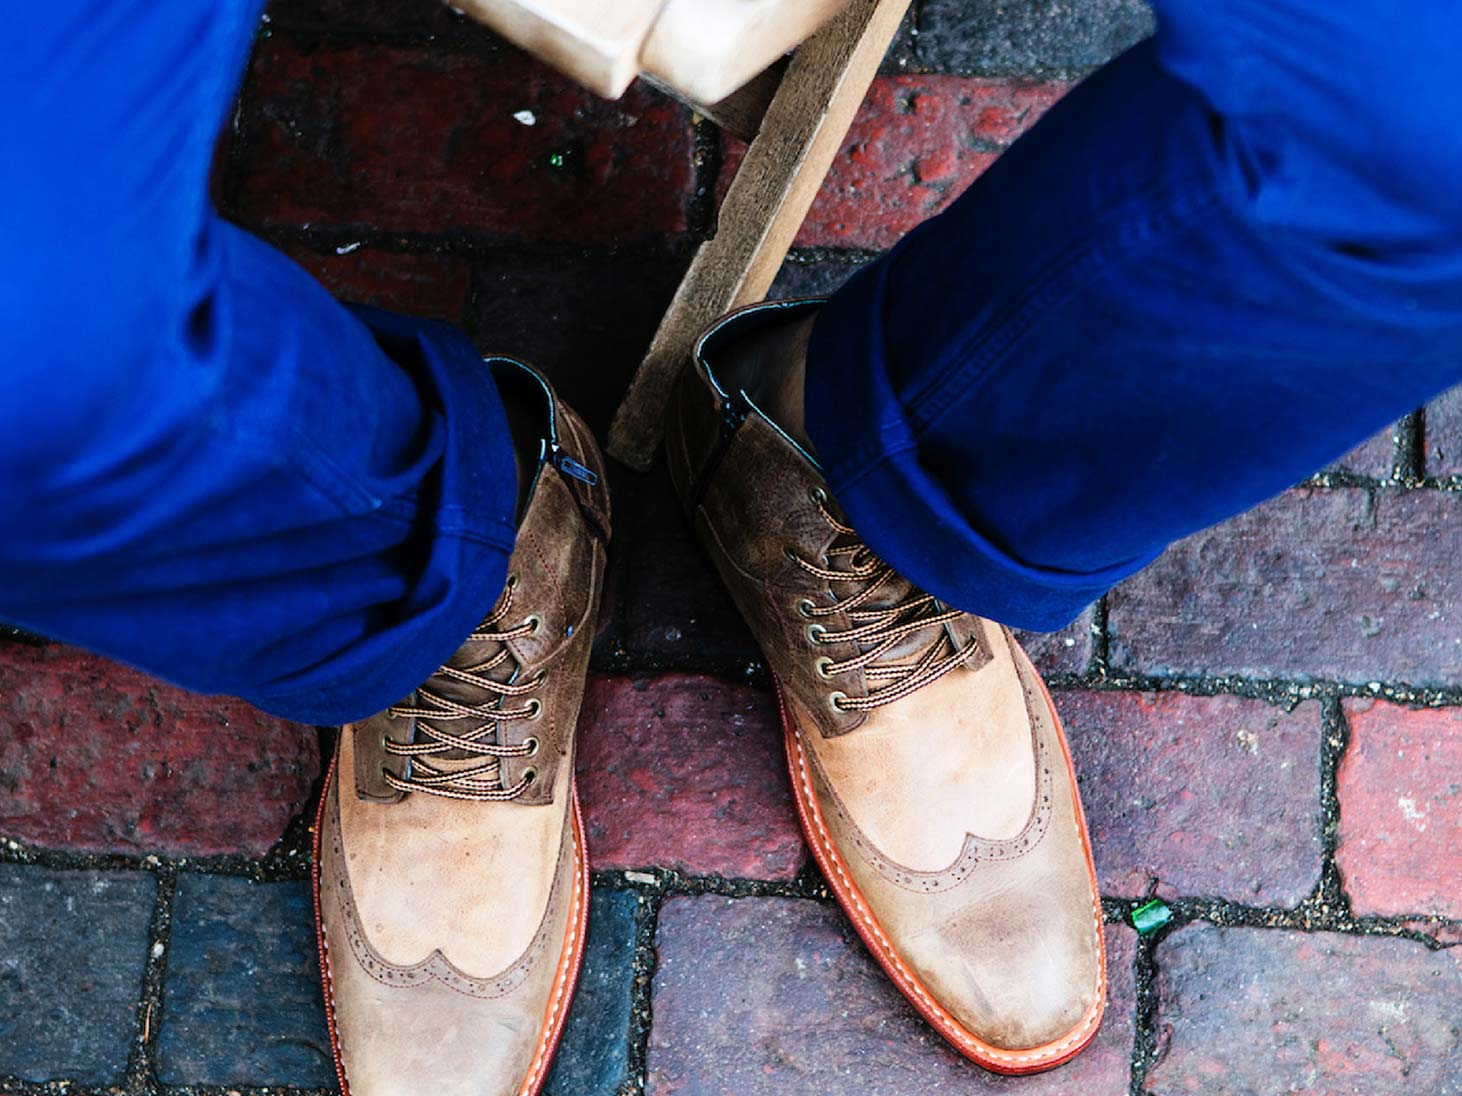 Adelante Shoe Inc. design